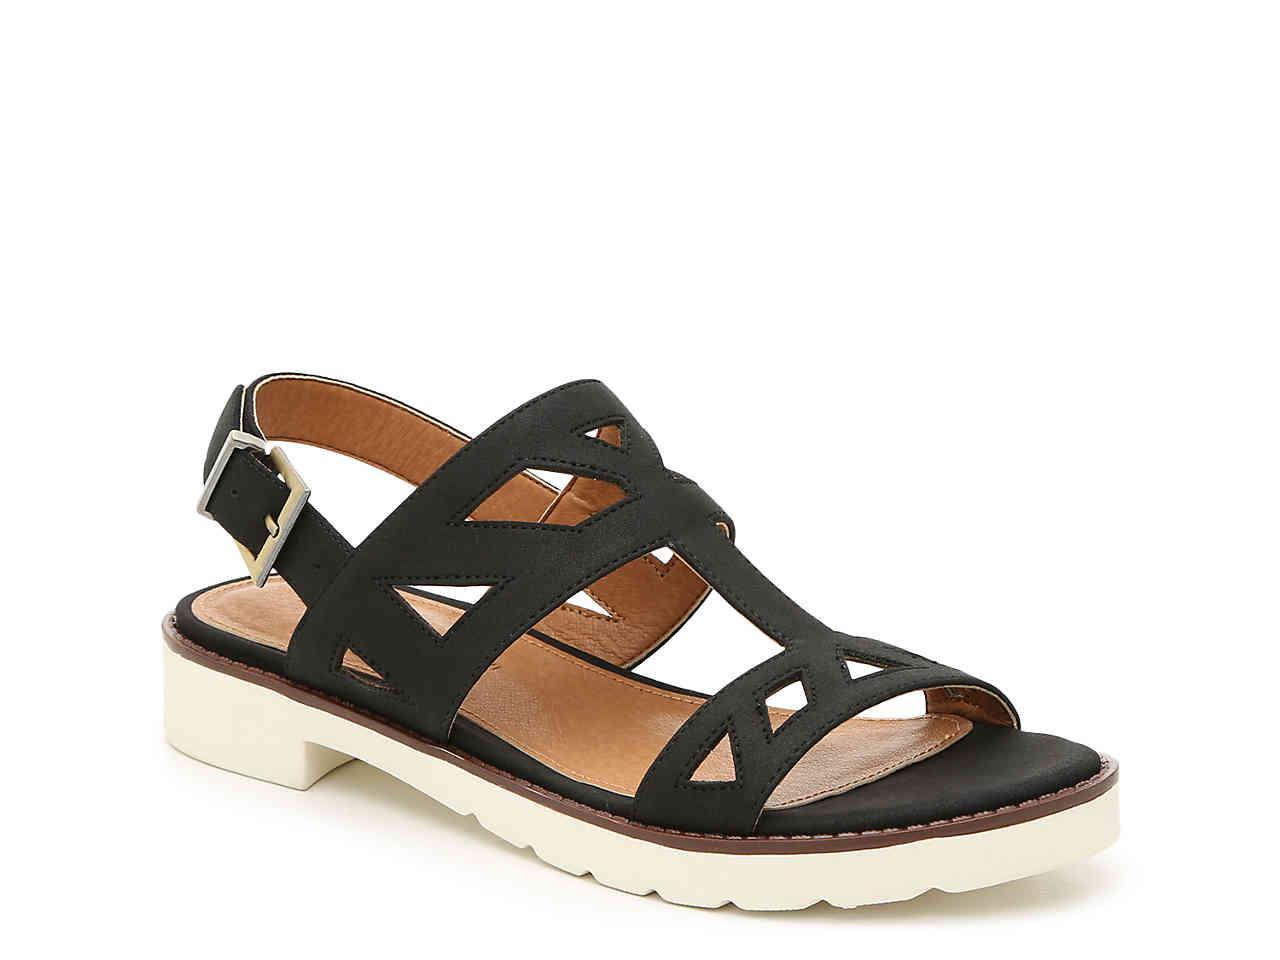 11ae1144a4bd Lyst - Adrienne Vittadini Seka Sandal in Black